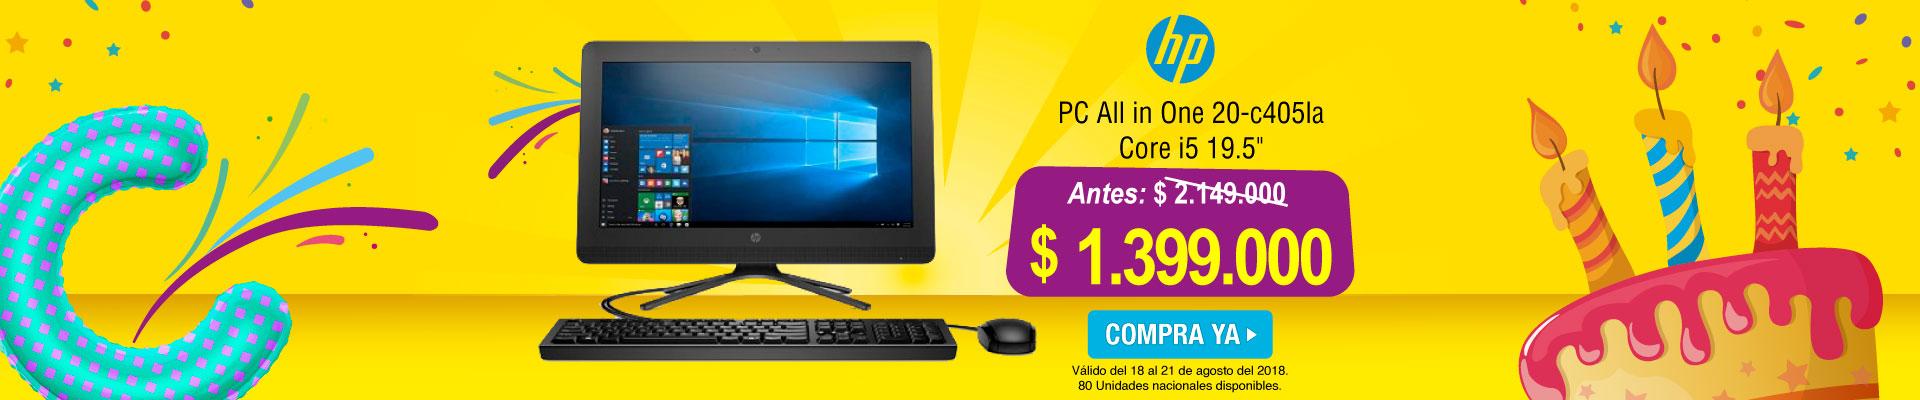 ALKP-PPAL-3-computadores y tablets-PP---Hp-Core i5 19.5